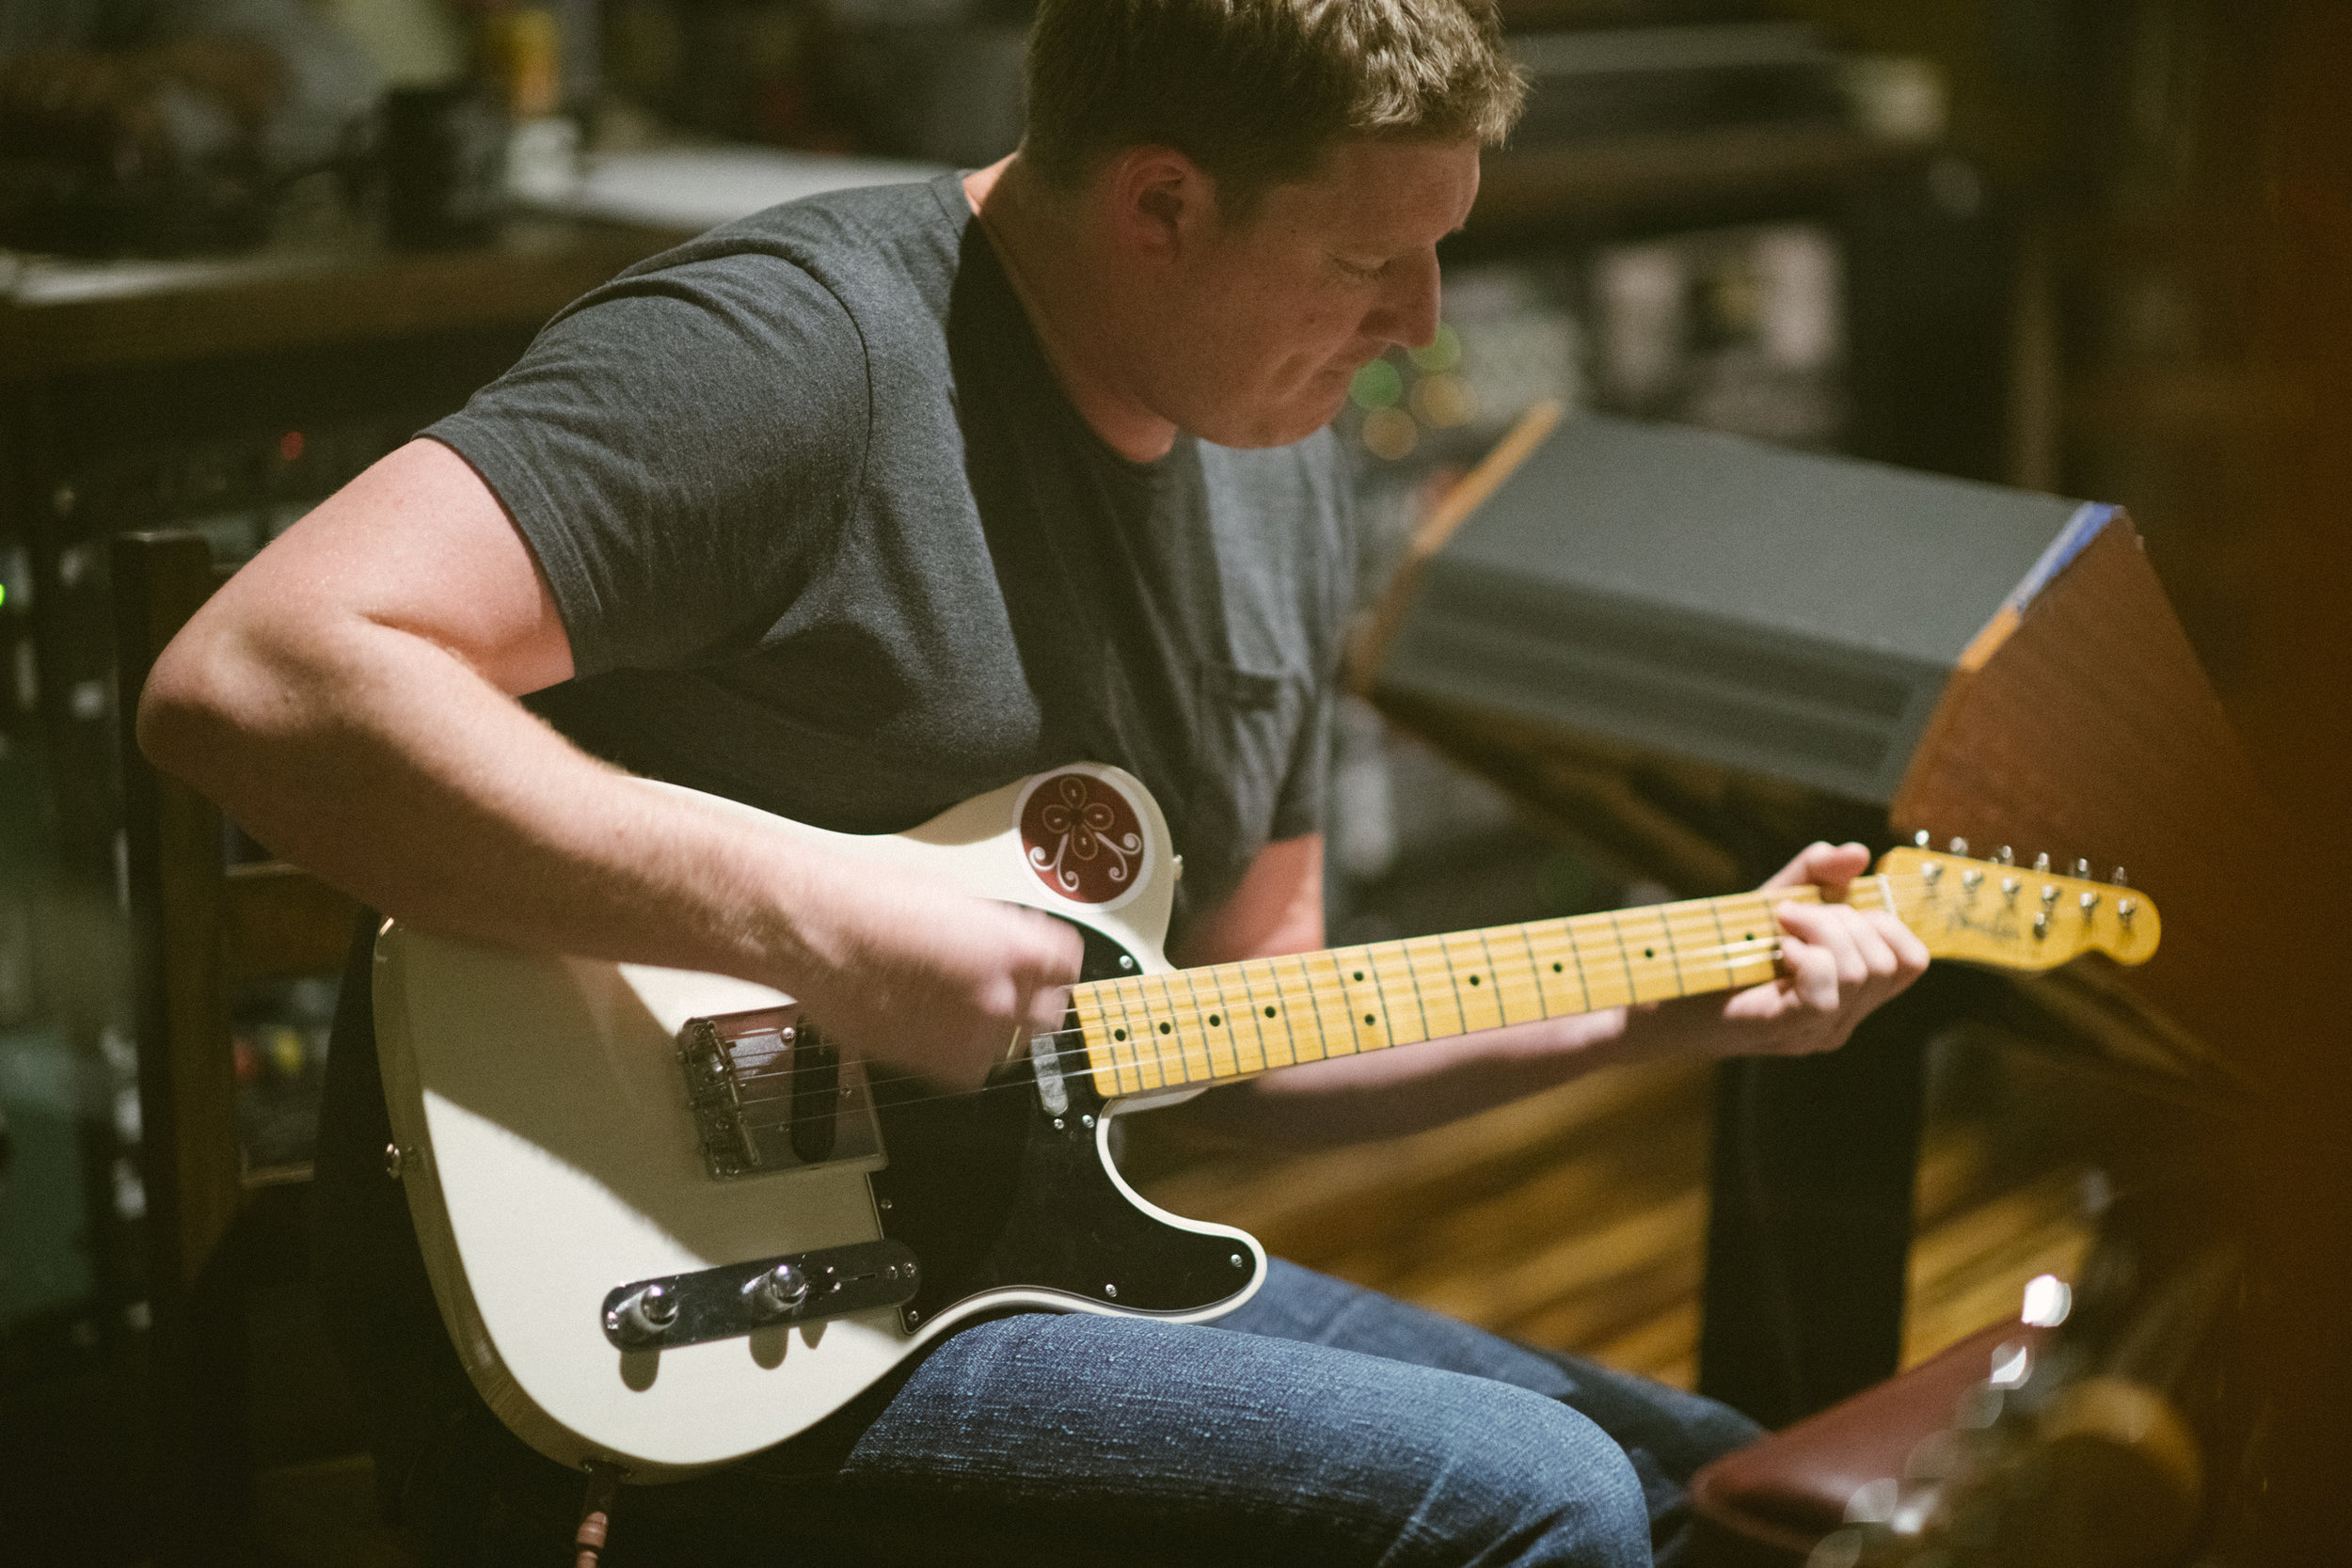 brian london - guitar & backup vocals